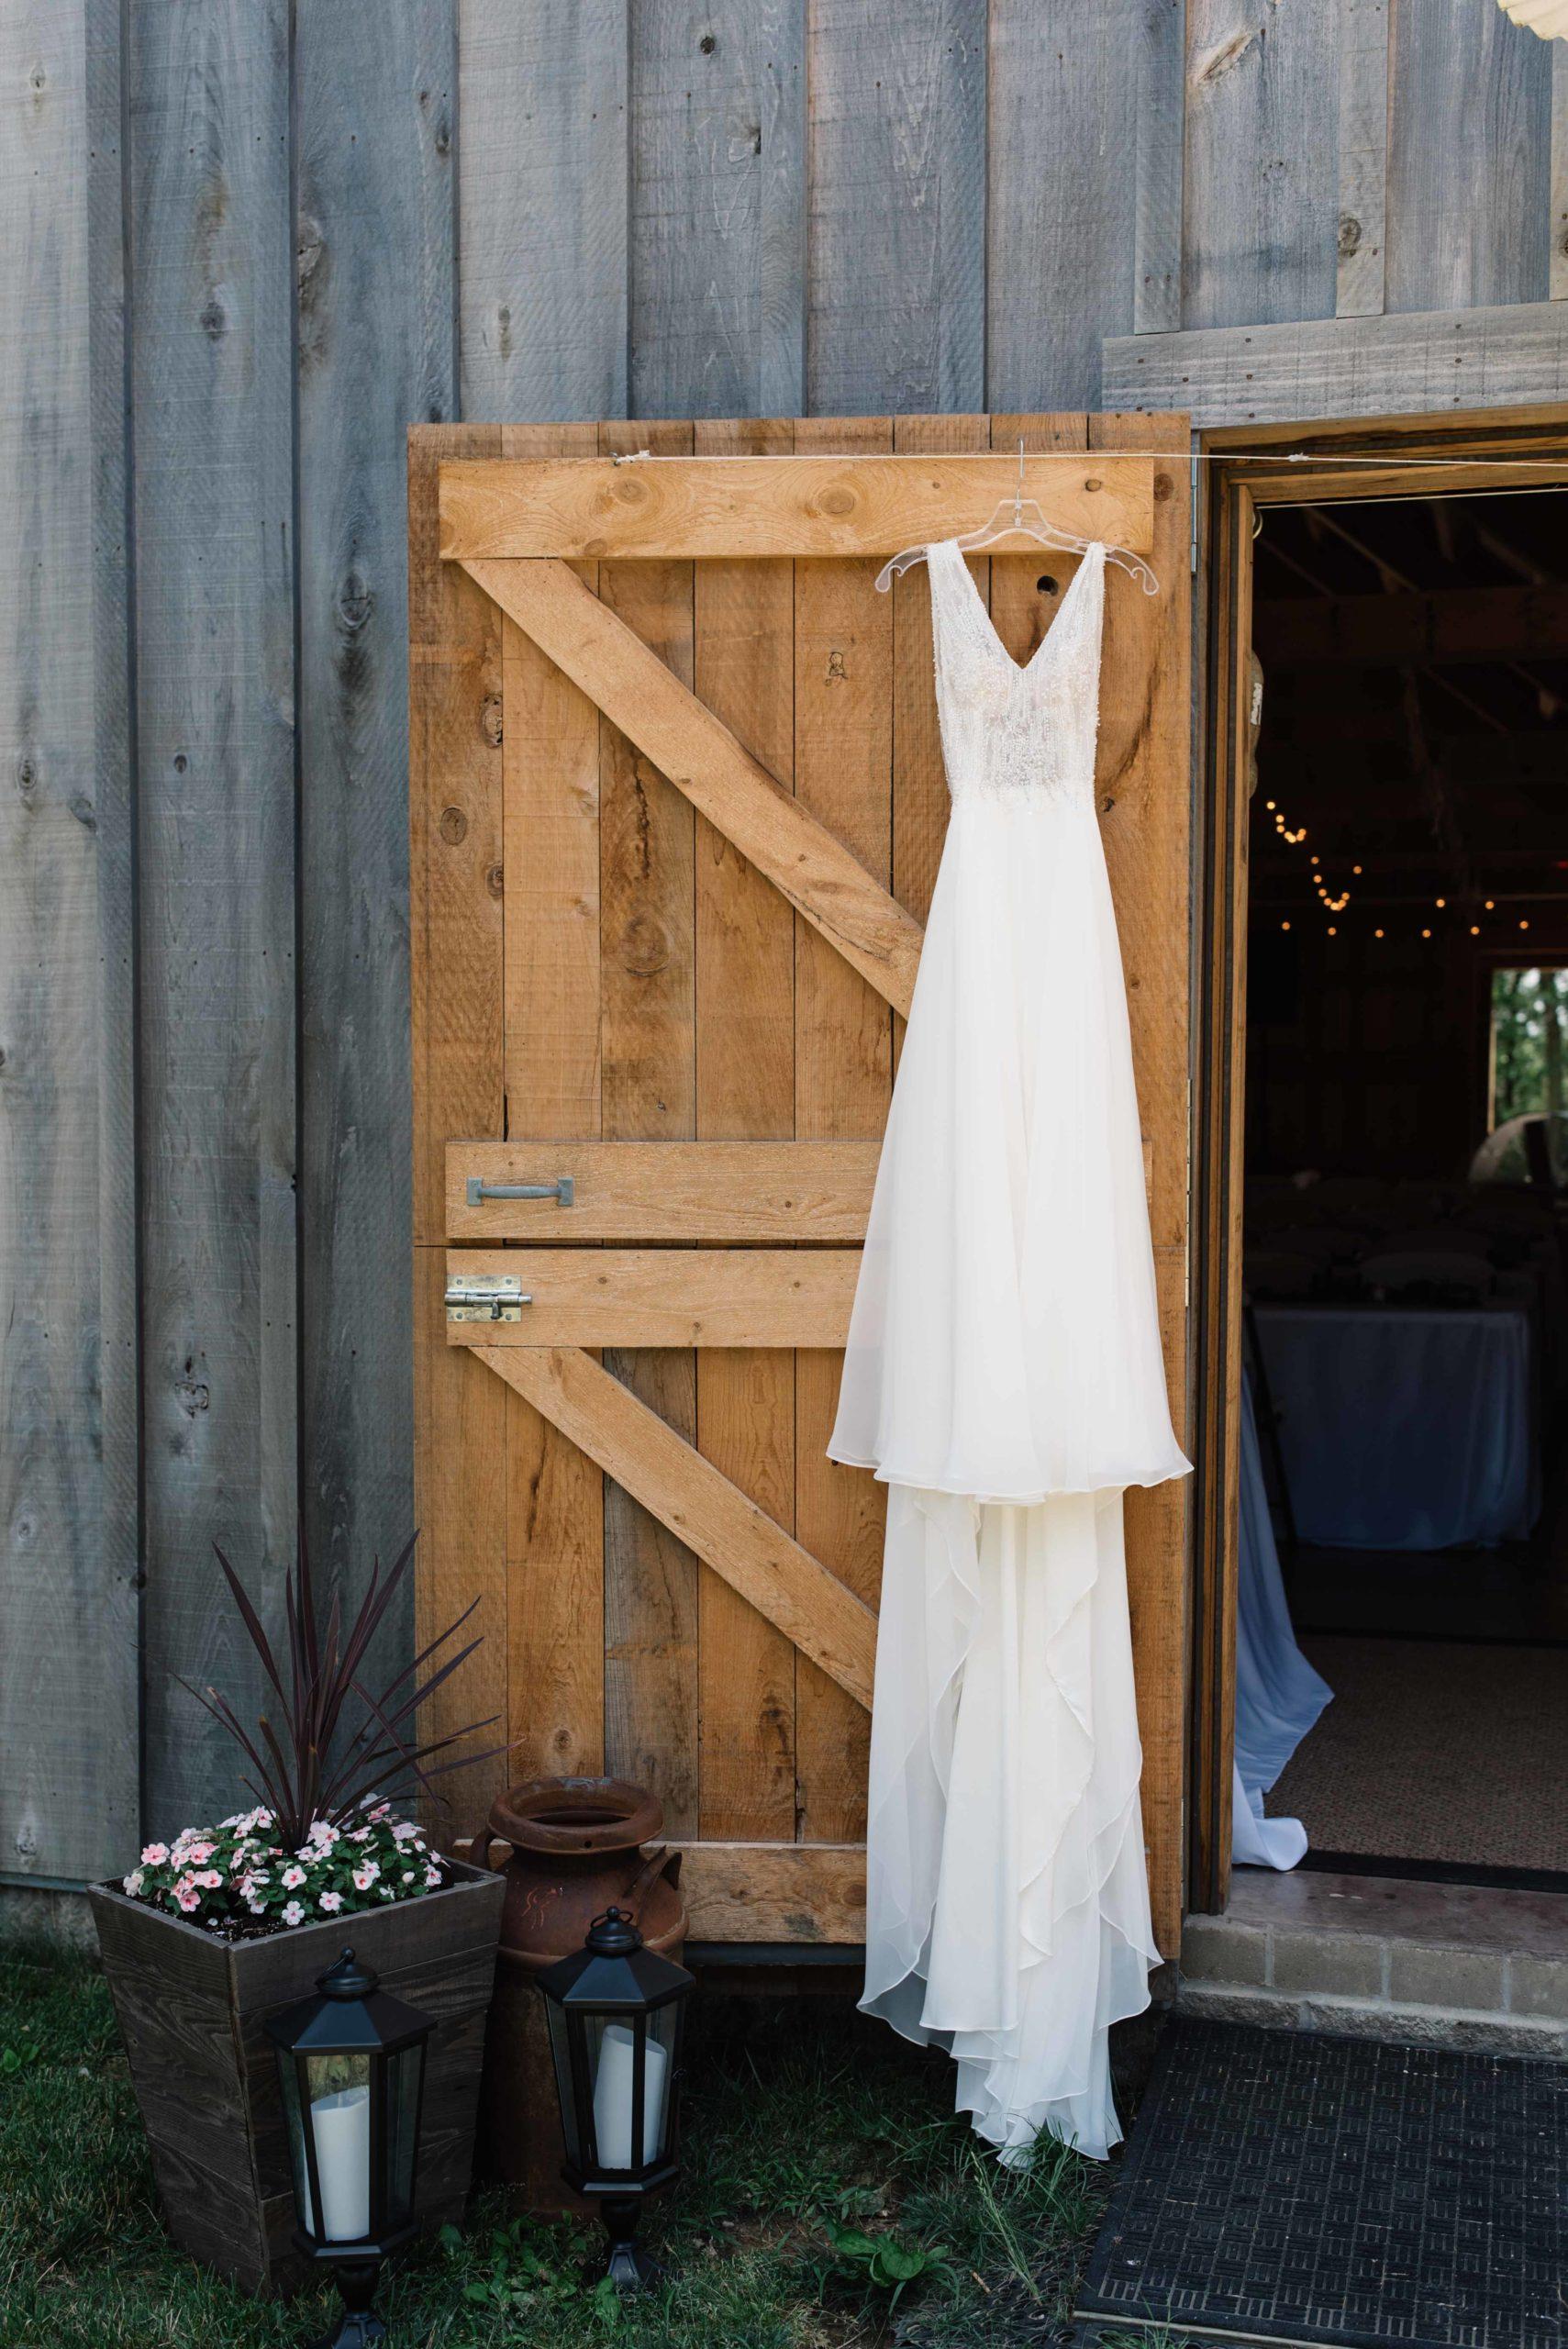 wedding dress hanging on barn door schafer century barn wedding venue